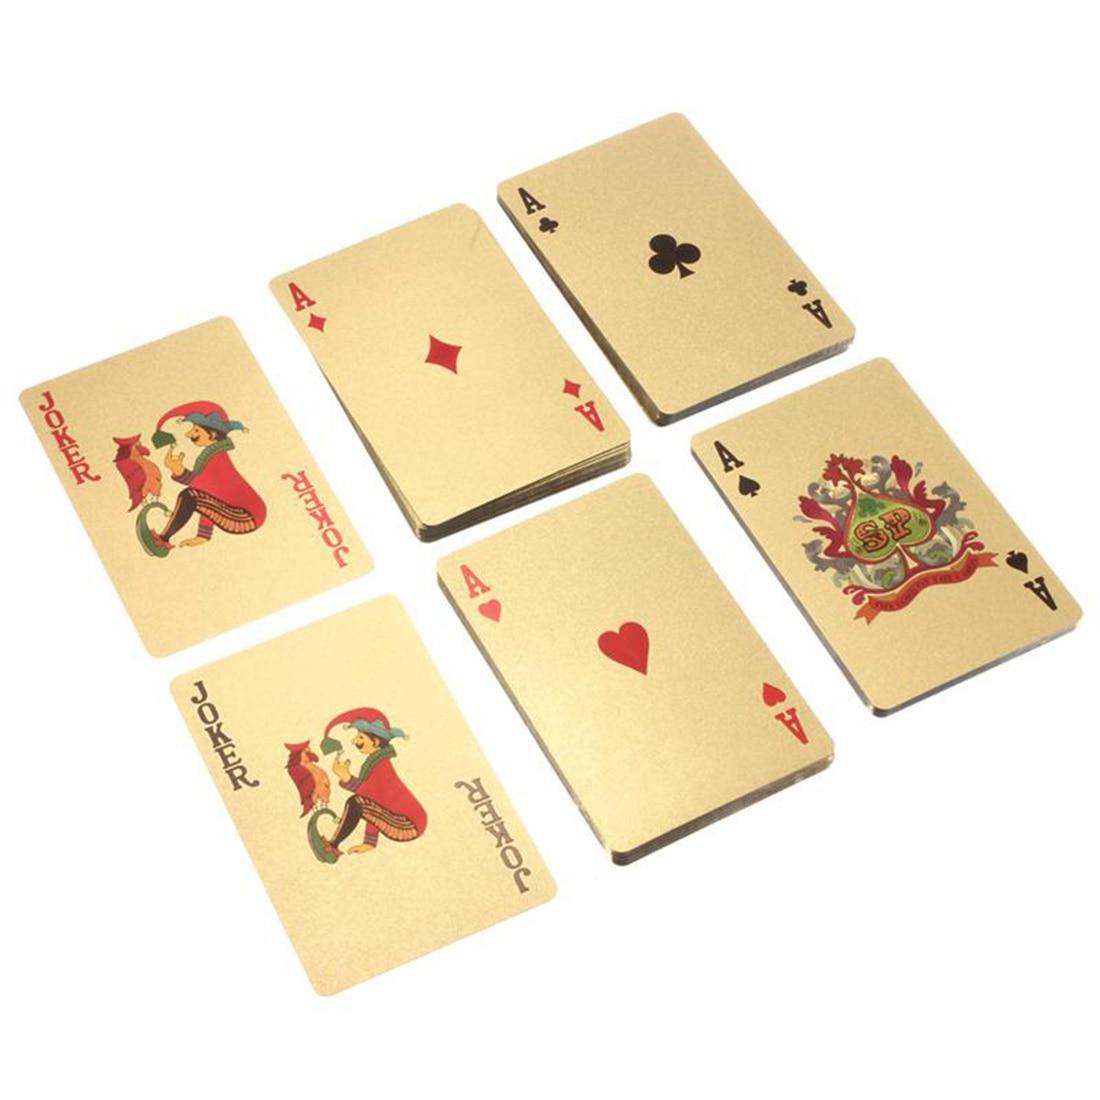 new-high-grade-24k-gold-foil-font-b-poker-b-font-lattice-grid-pattern-playing-cards-font-b-poker-b-font